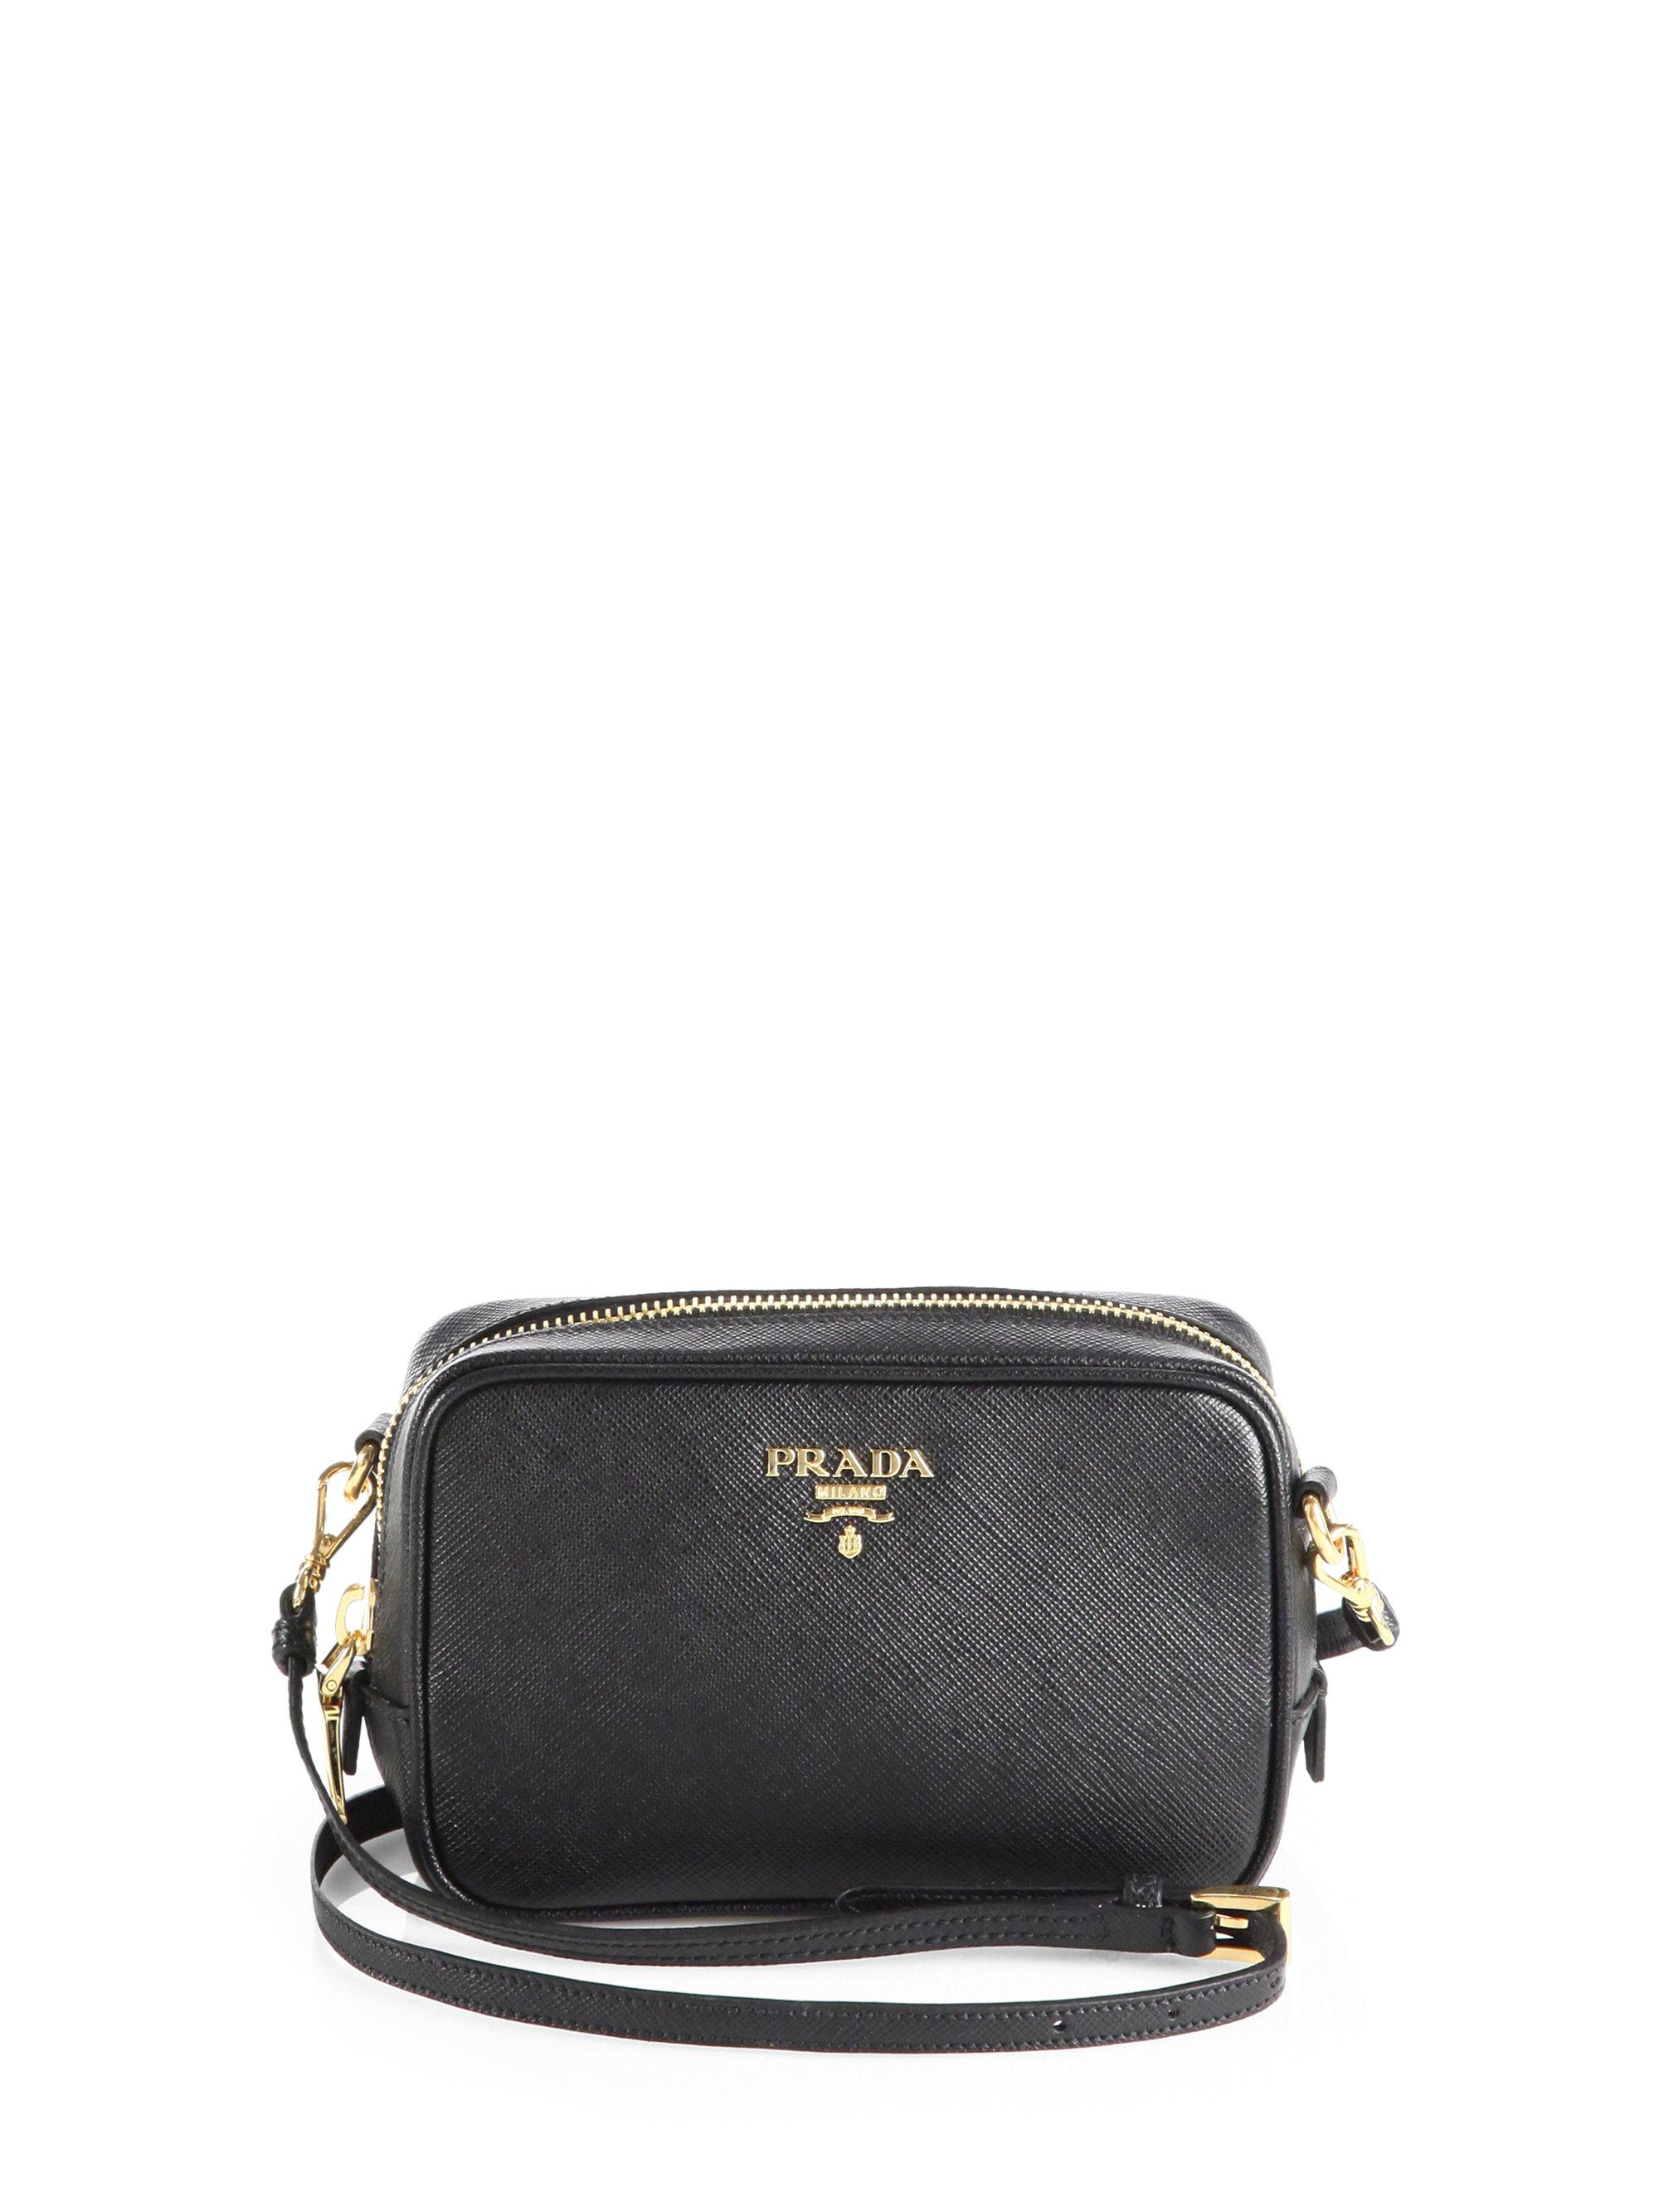 red prada messenger bag - Prada Saffiano Leather Camera Bag in Black (NERO-BLACK) | Lyst